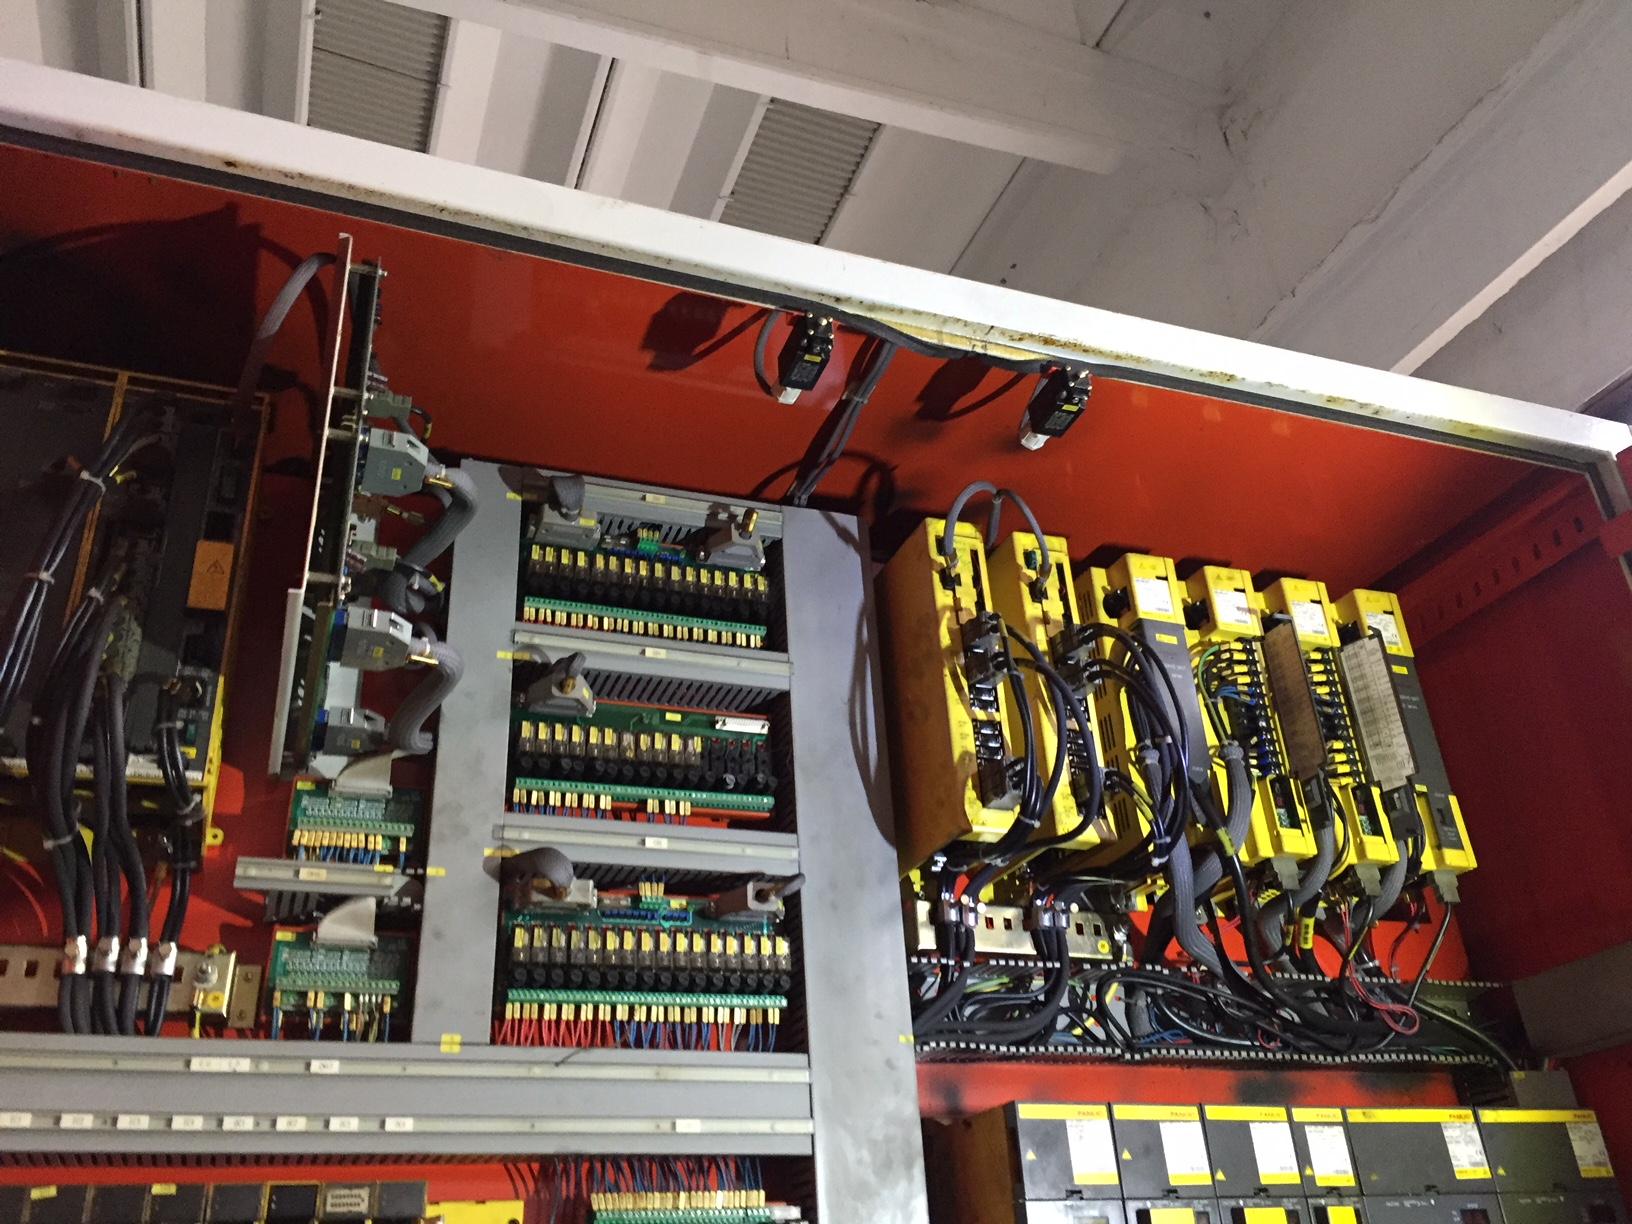 Lot 11 - Linea Spazio Model 20 tipo 11 CNC Horizontal Machining Center